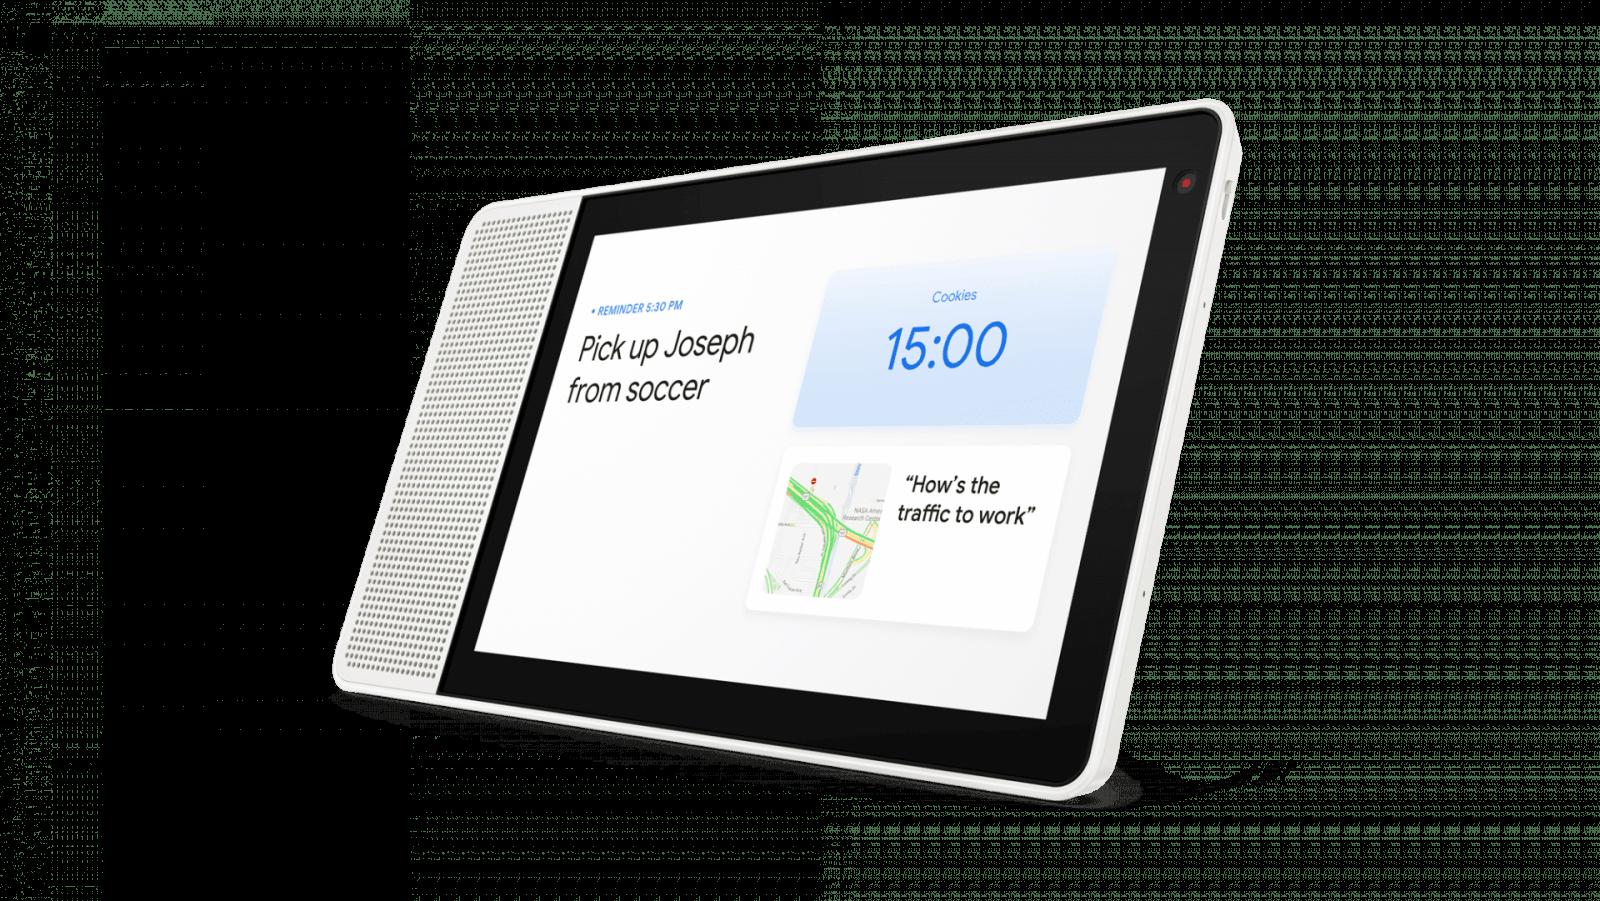 10 inch Lenovo Smart Display shows home screen - Lenovo представил цифрового помощника Smart Display со встроенным интерфейсом Google Assistant